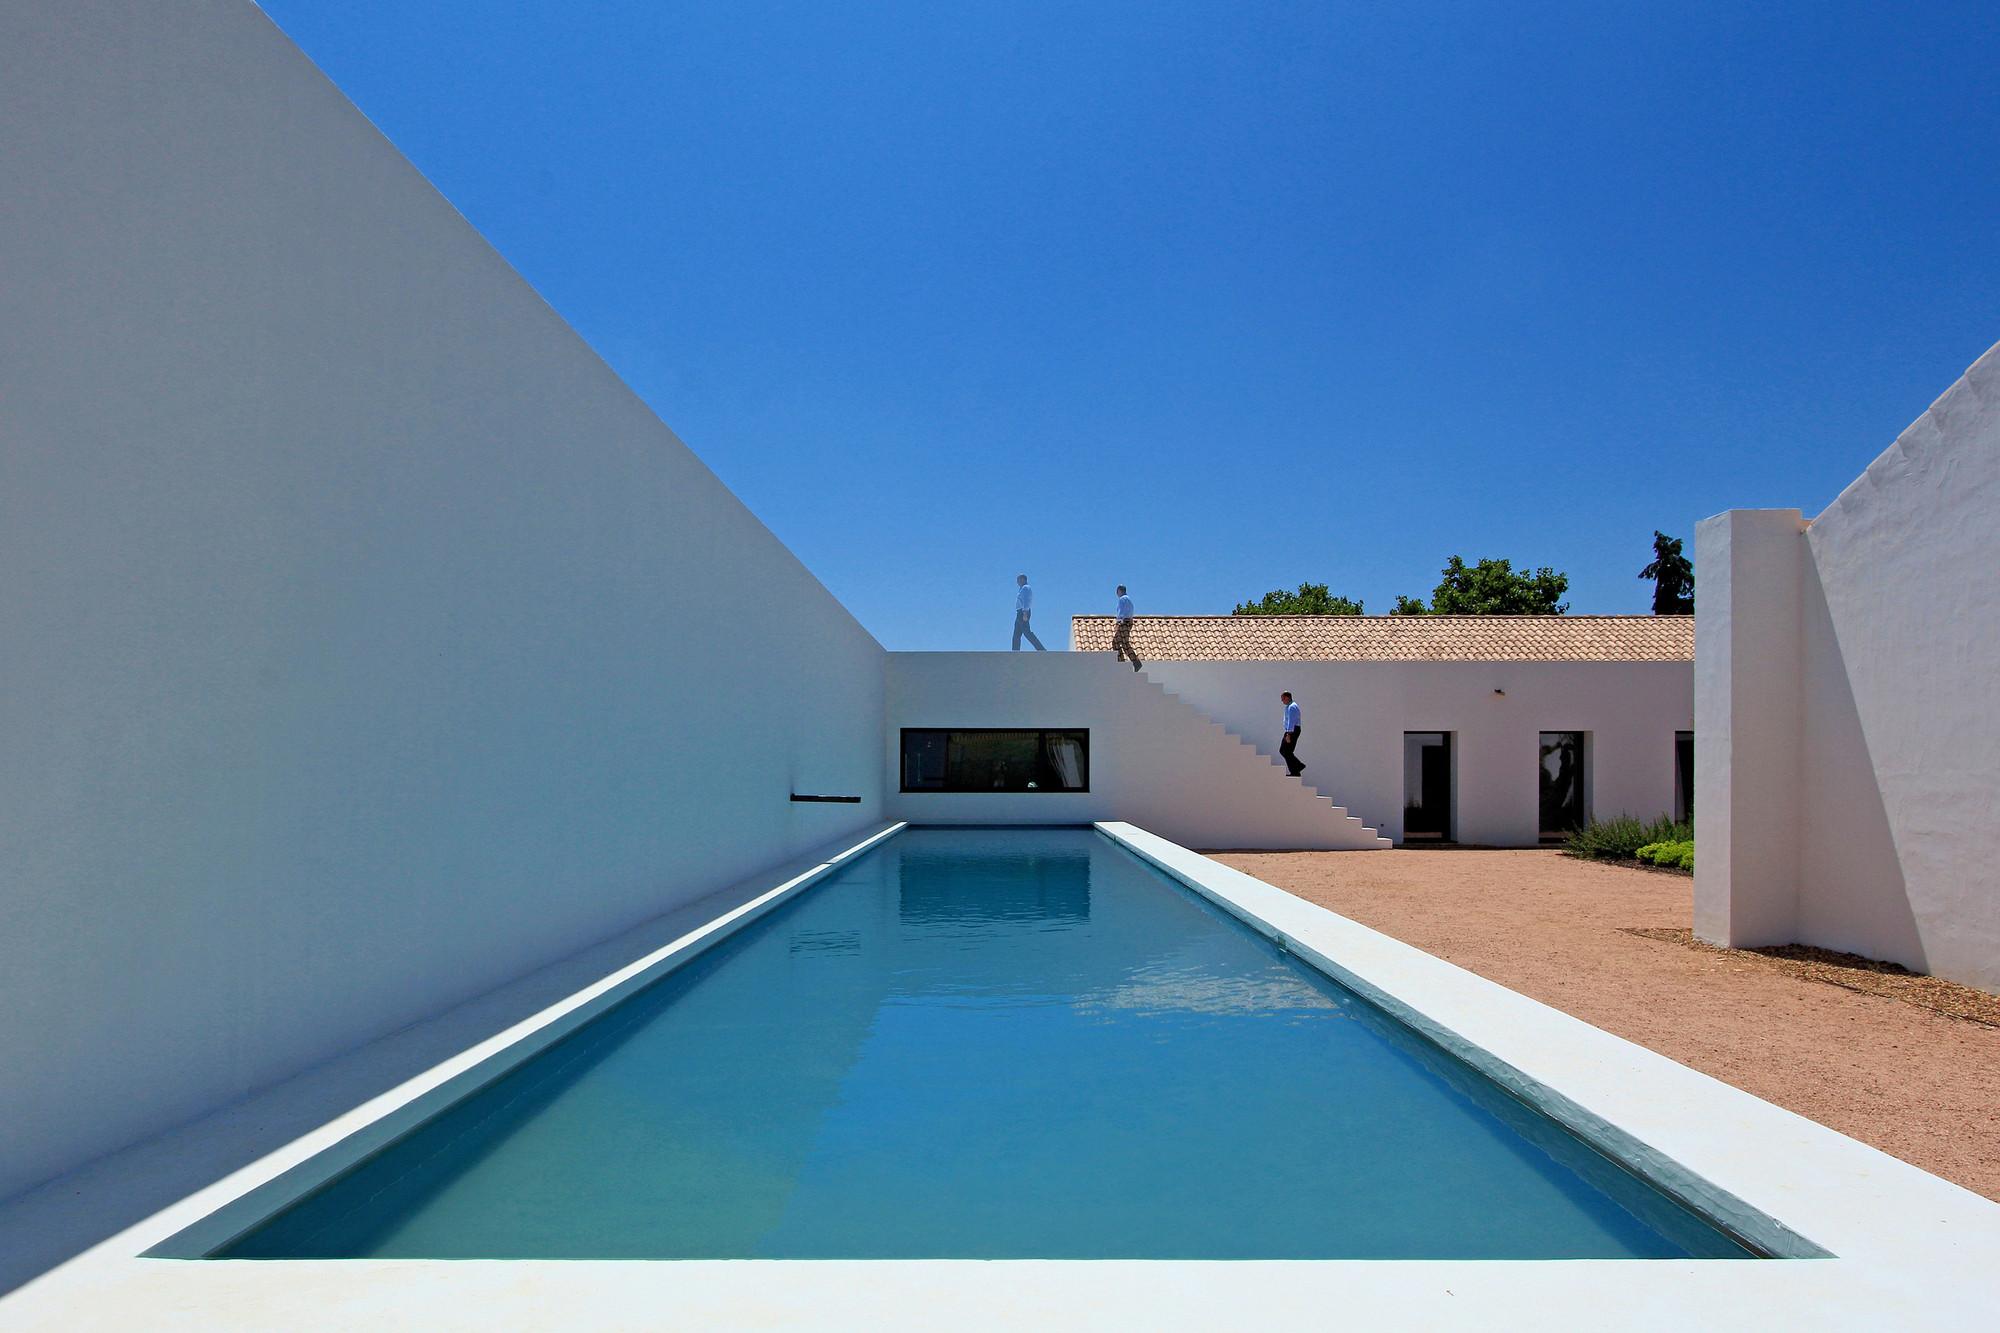 House in Vila Boim / Intergaup, Courtesy of Intergaup